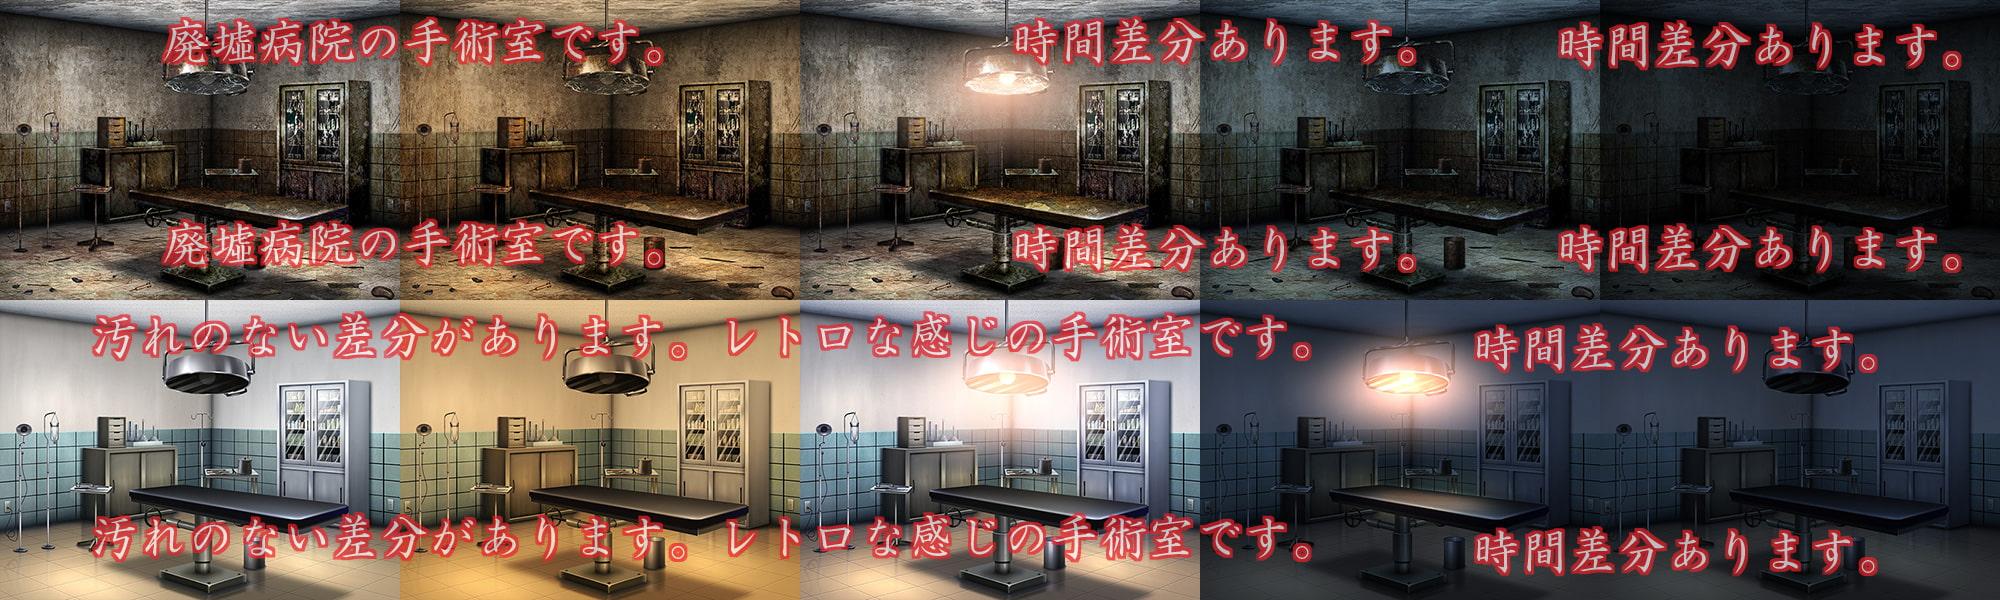 DLsite専売著作権フリー背景CG素材「廃墟手術室」